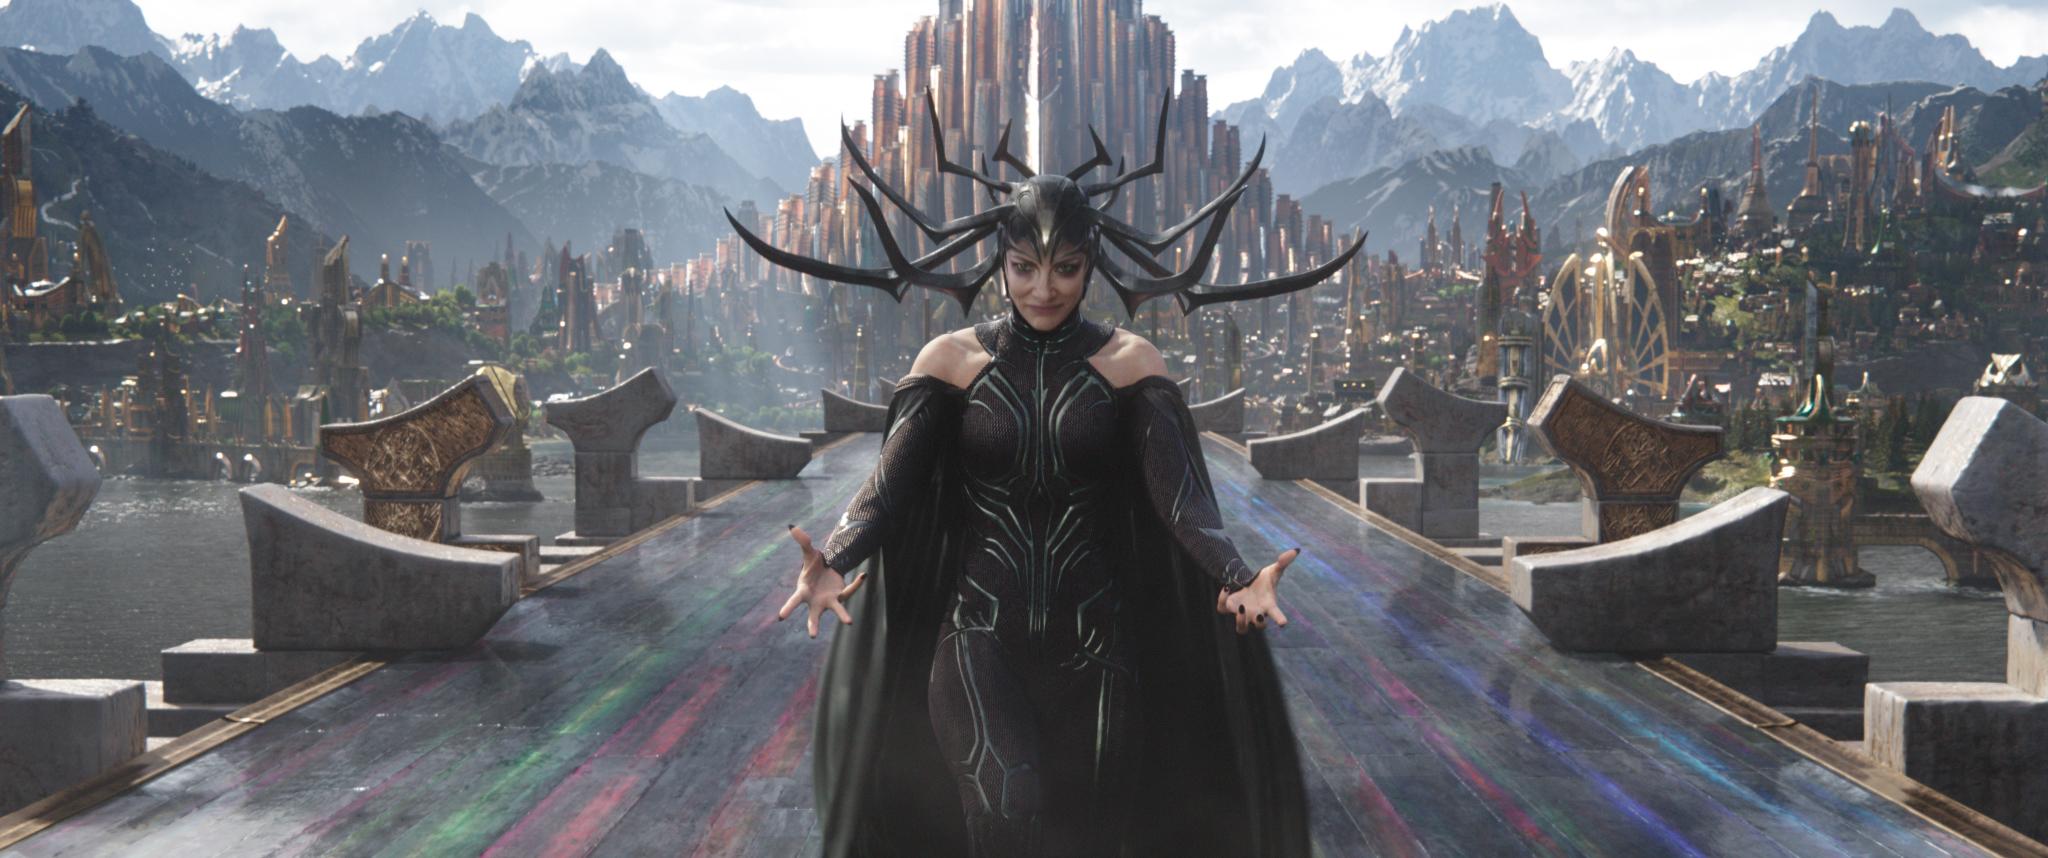 Cate Blanchett Thor 3 Ragnarok